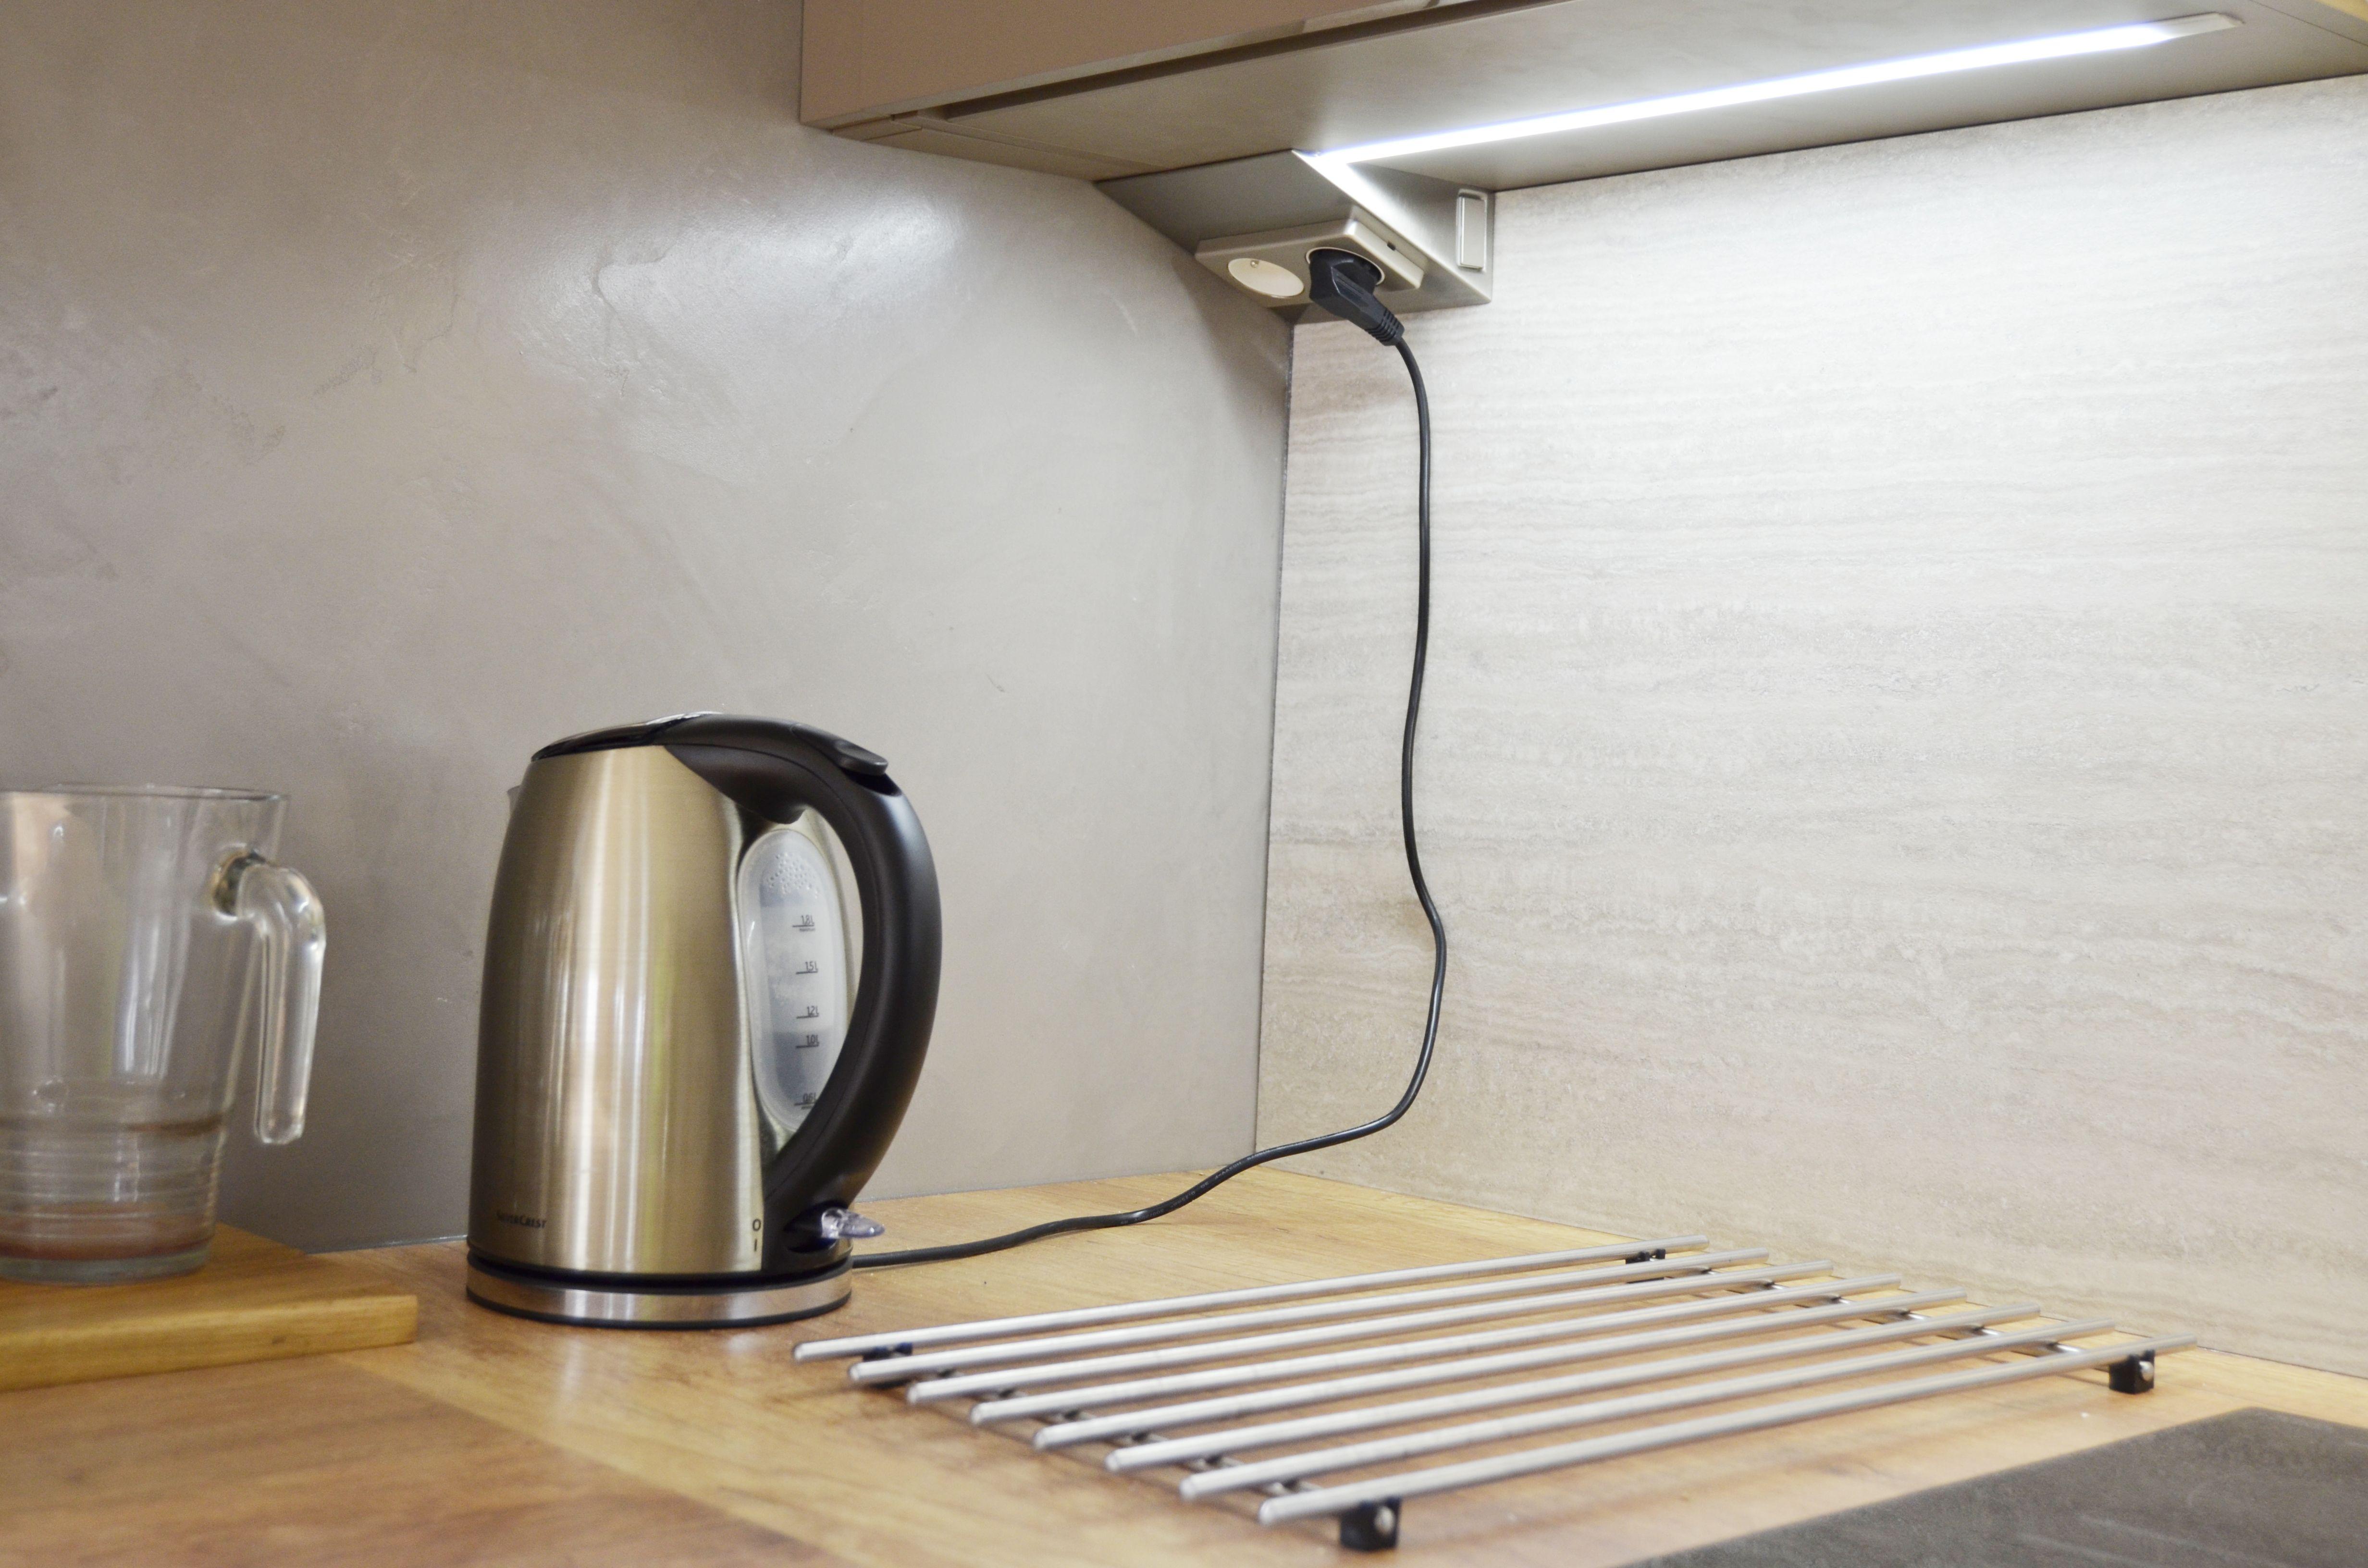 Realizace Kuchynske Linky Elite Detail Zasuvky V Urovni Hornich